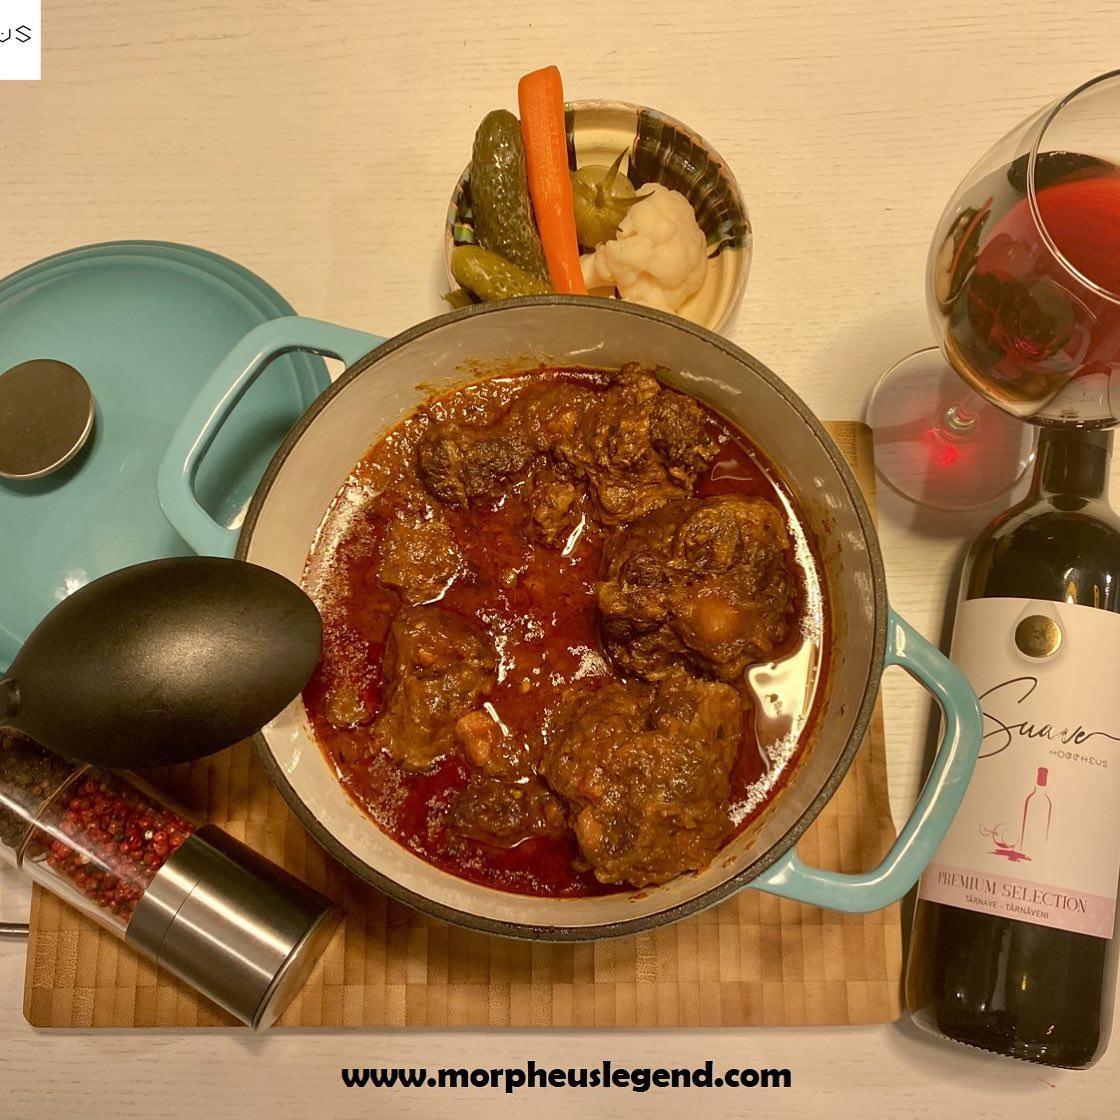 Tocana andaluza din coada de vitel asezonata cu vin rosu sec, Suave by Morpheus